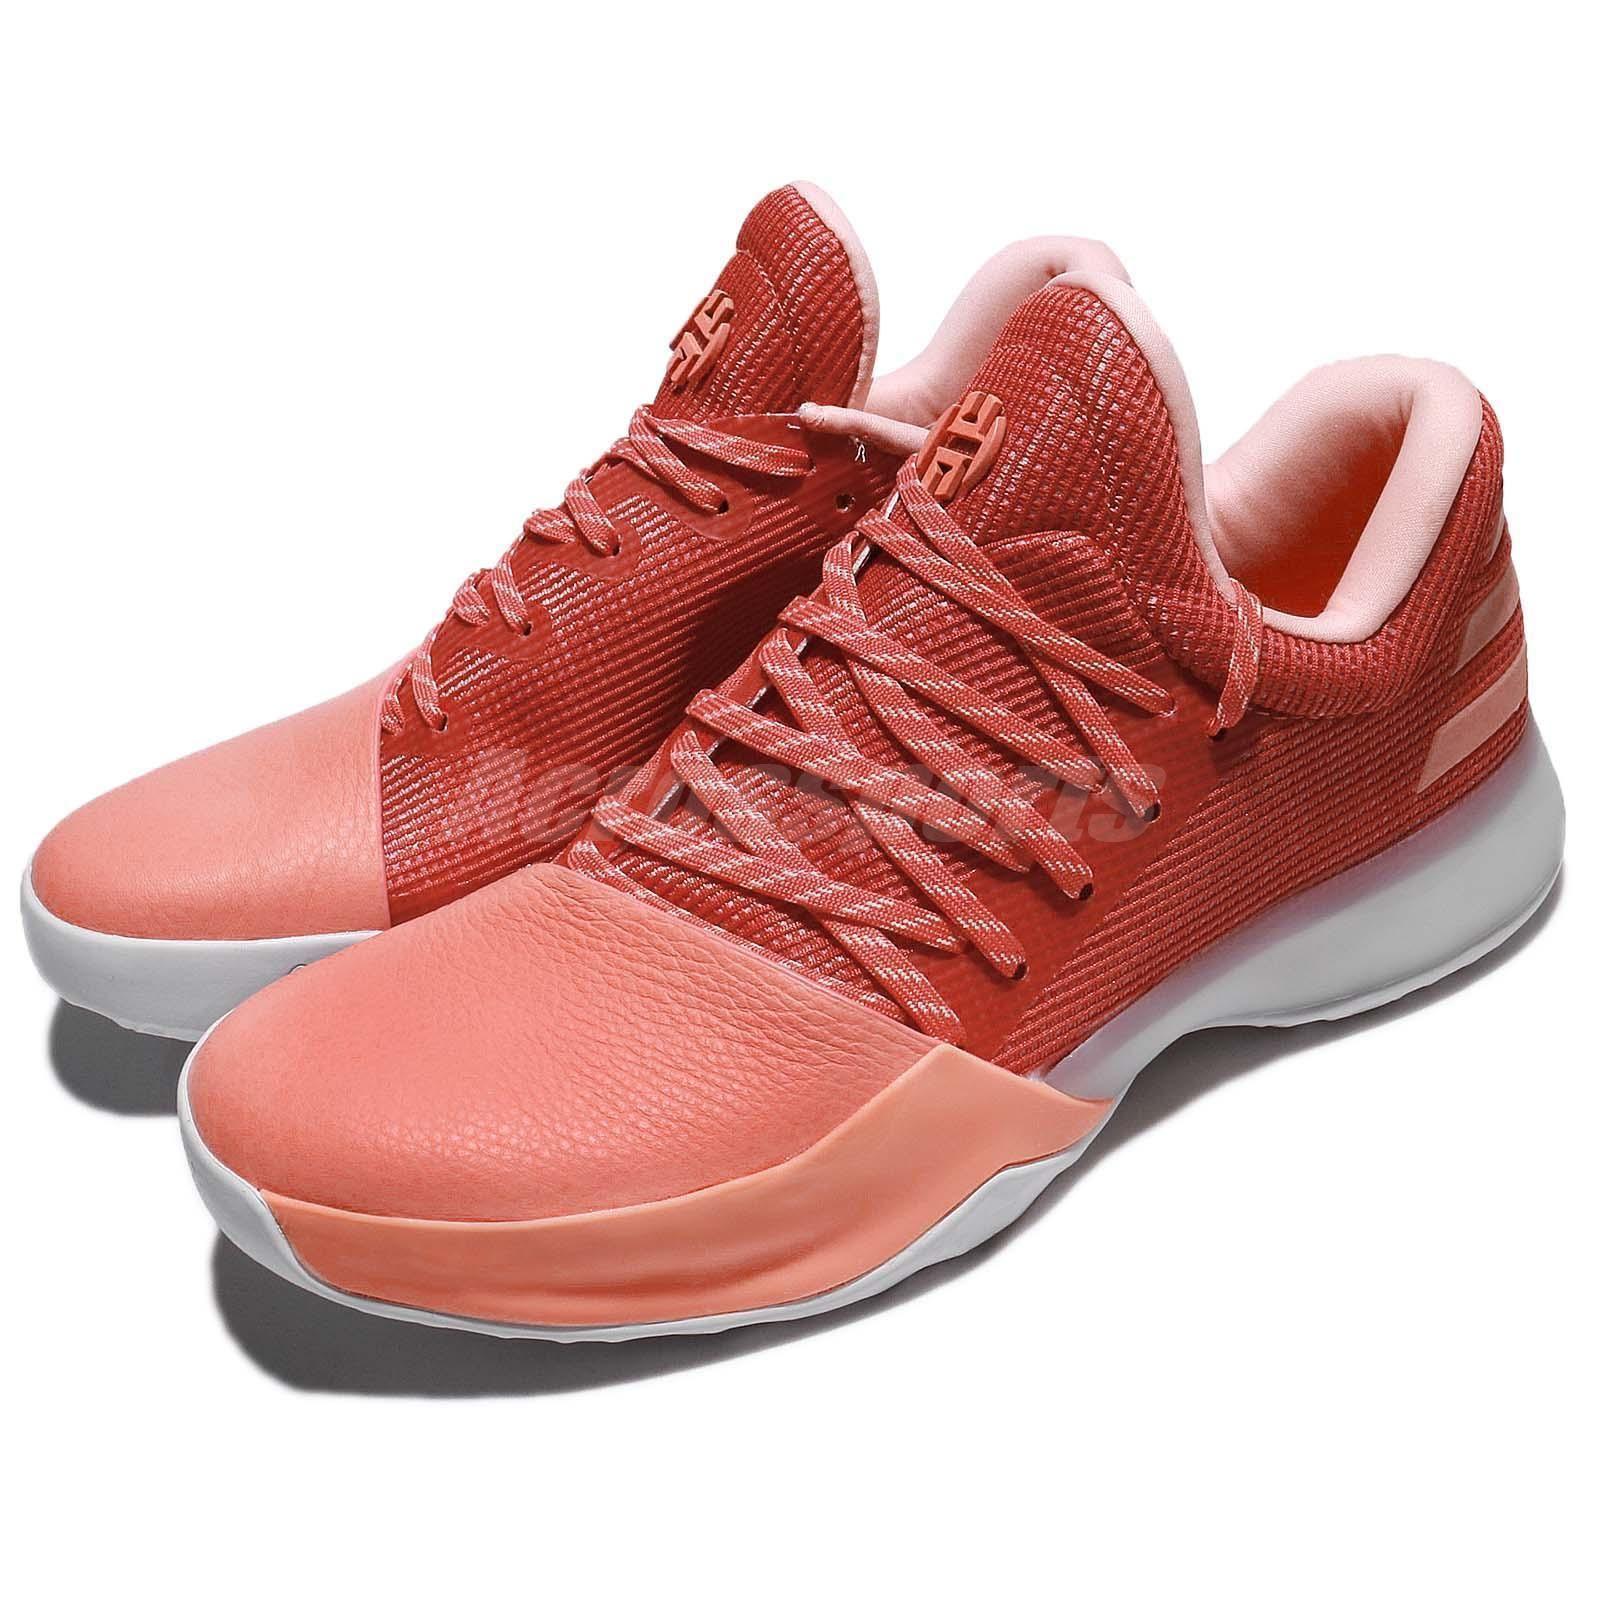 31589e409a7 adidas Harden Vol. 1 Chalk Coral Scarlet Two-Tone Men Basketball Shoes  AH2119